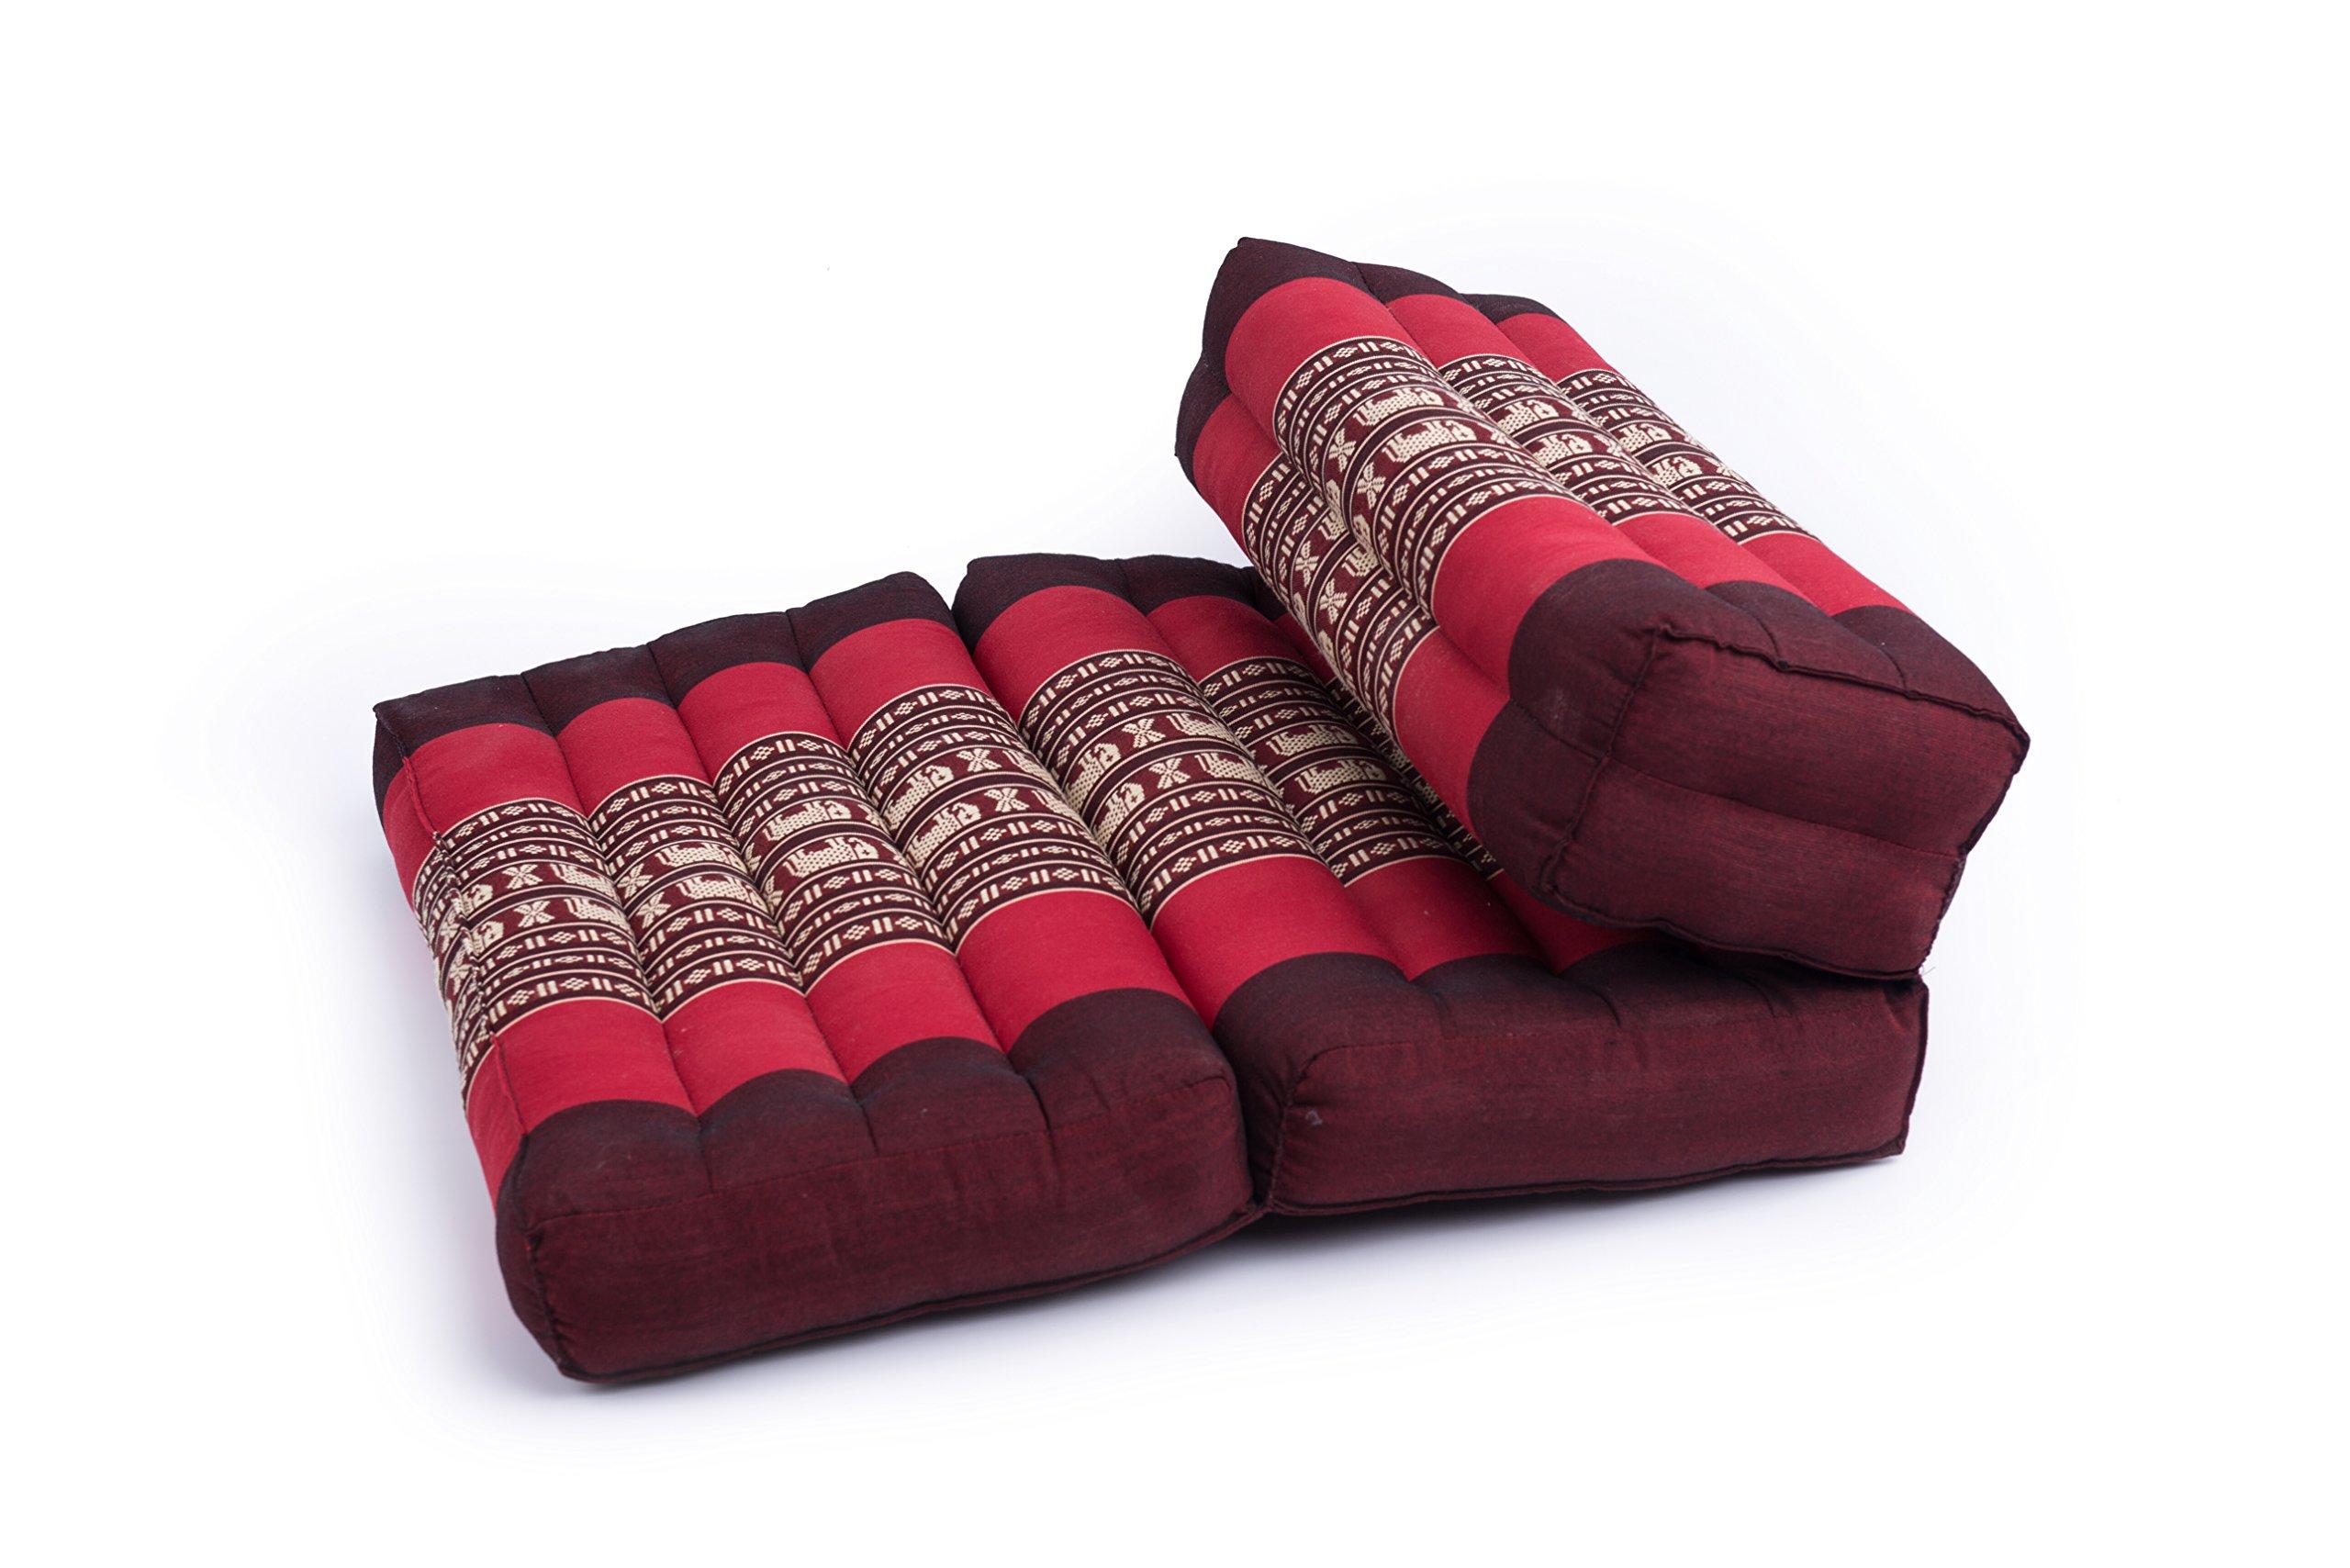 Foldable Meditation Cushion, 100% Kapok, Red Elephants by Kapok Dreams